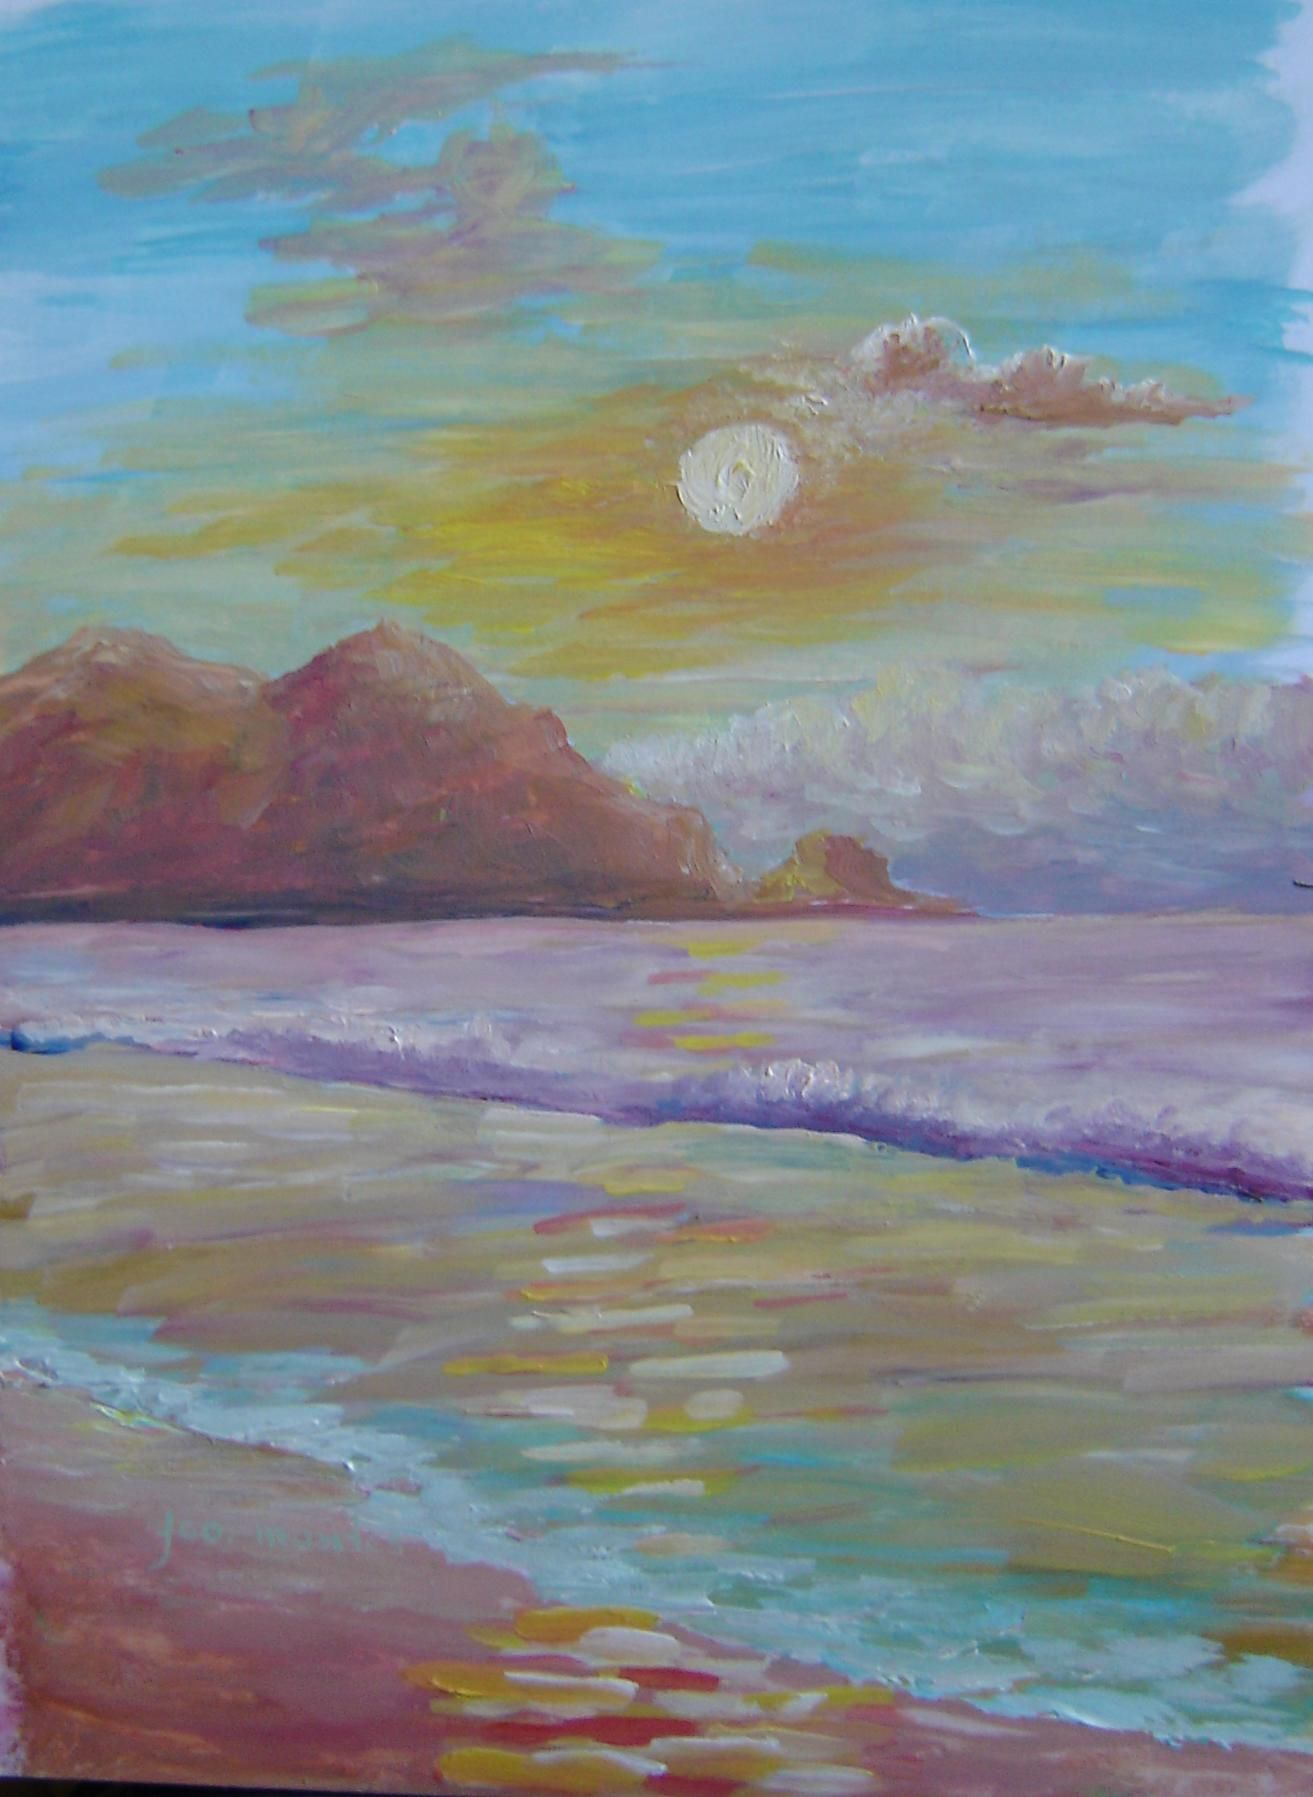 Aterdecer en la playa #fcomontespintor #queretaro #arte